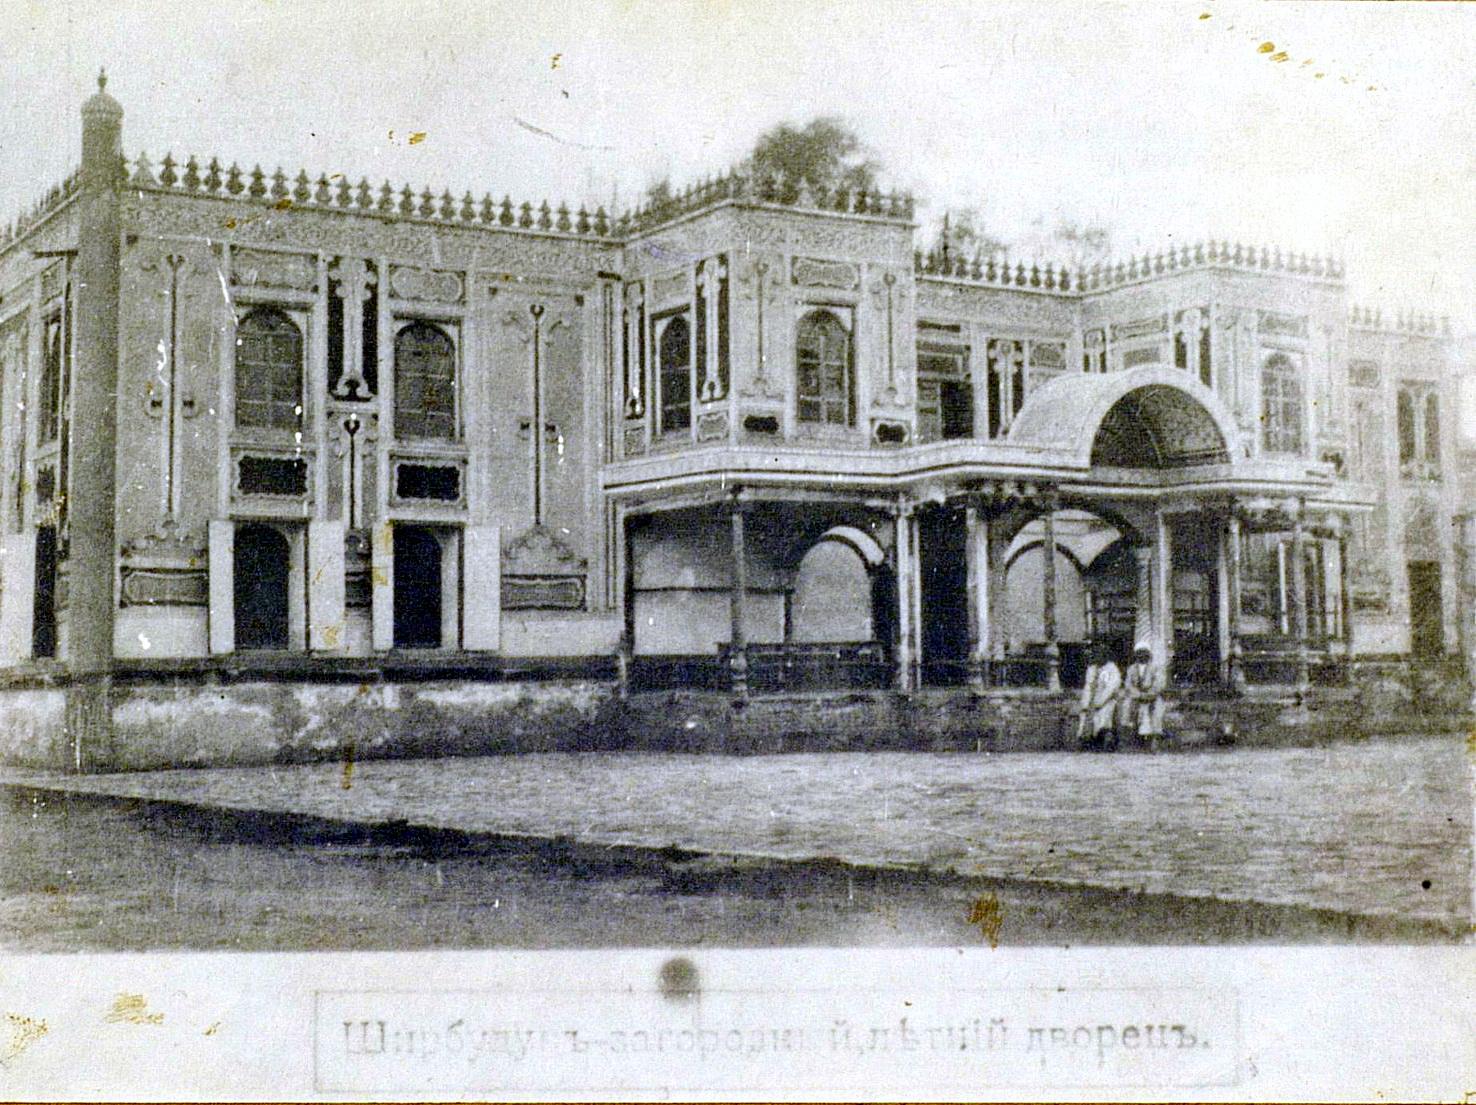 1898 Ширбудун. Загородный летний дворец эмира. Воронец Эммануил Дмитриевич